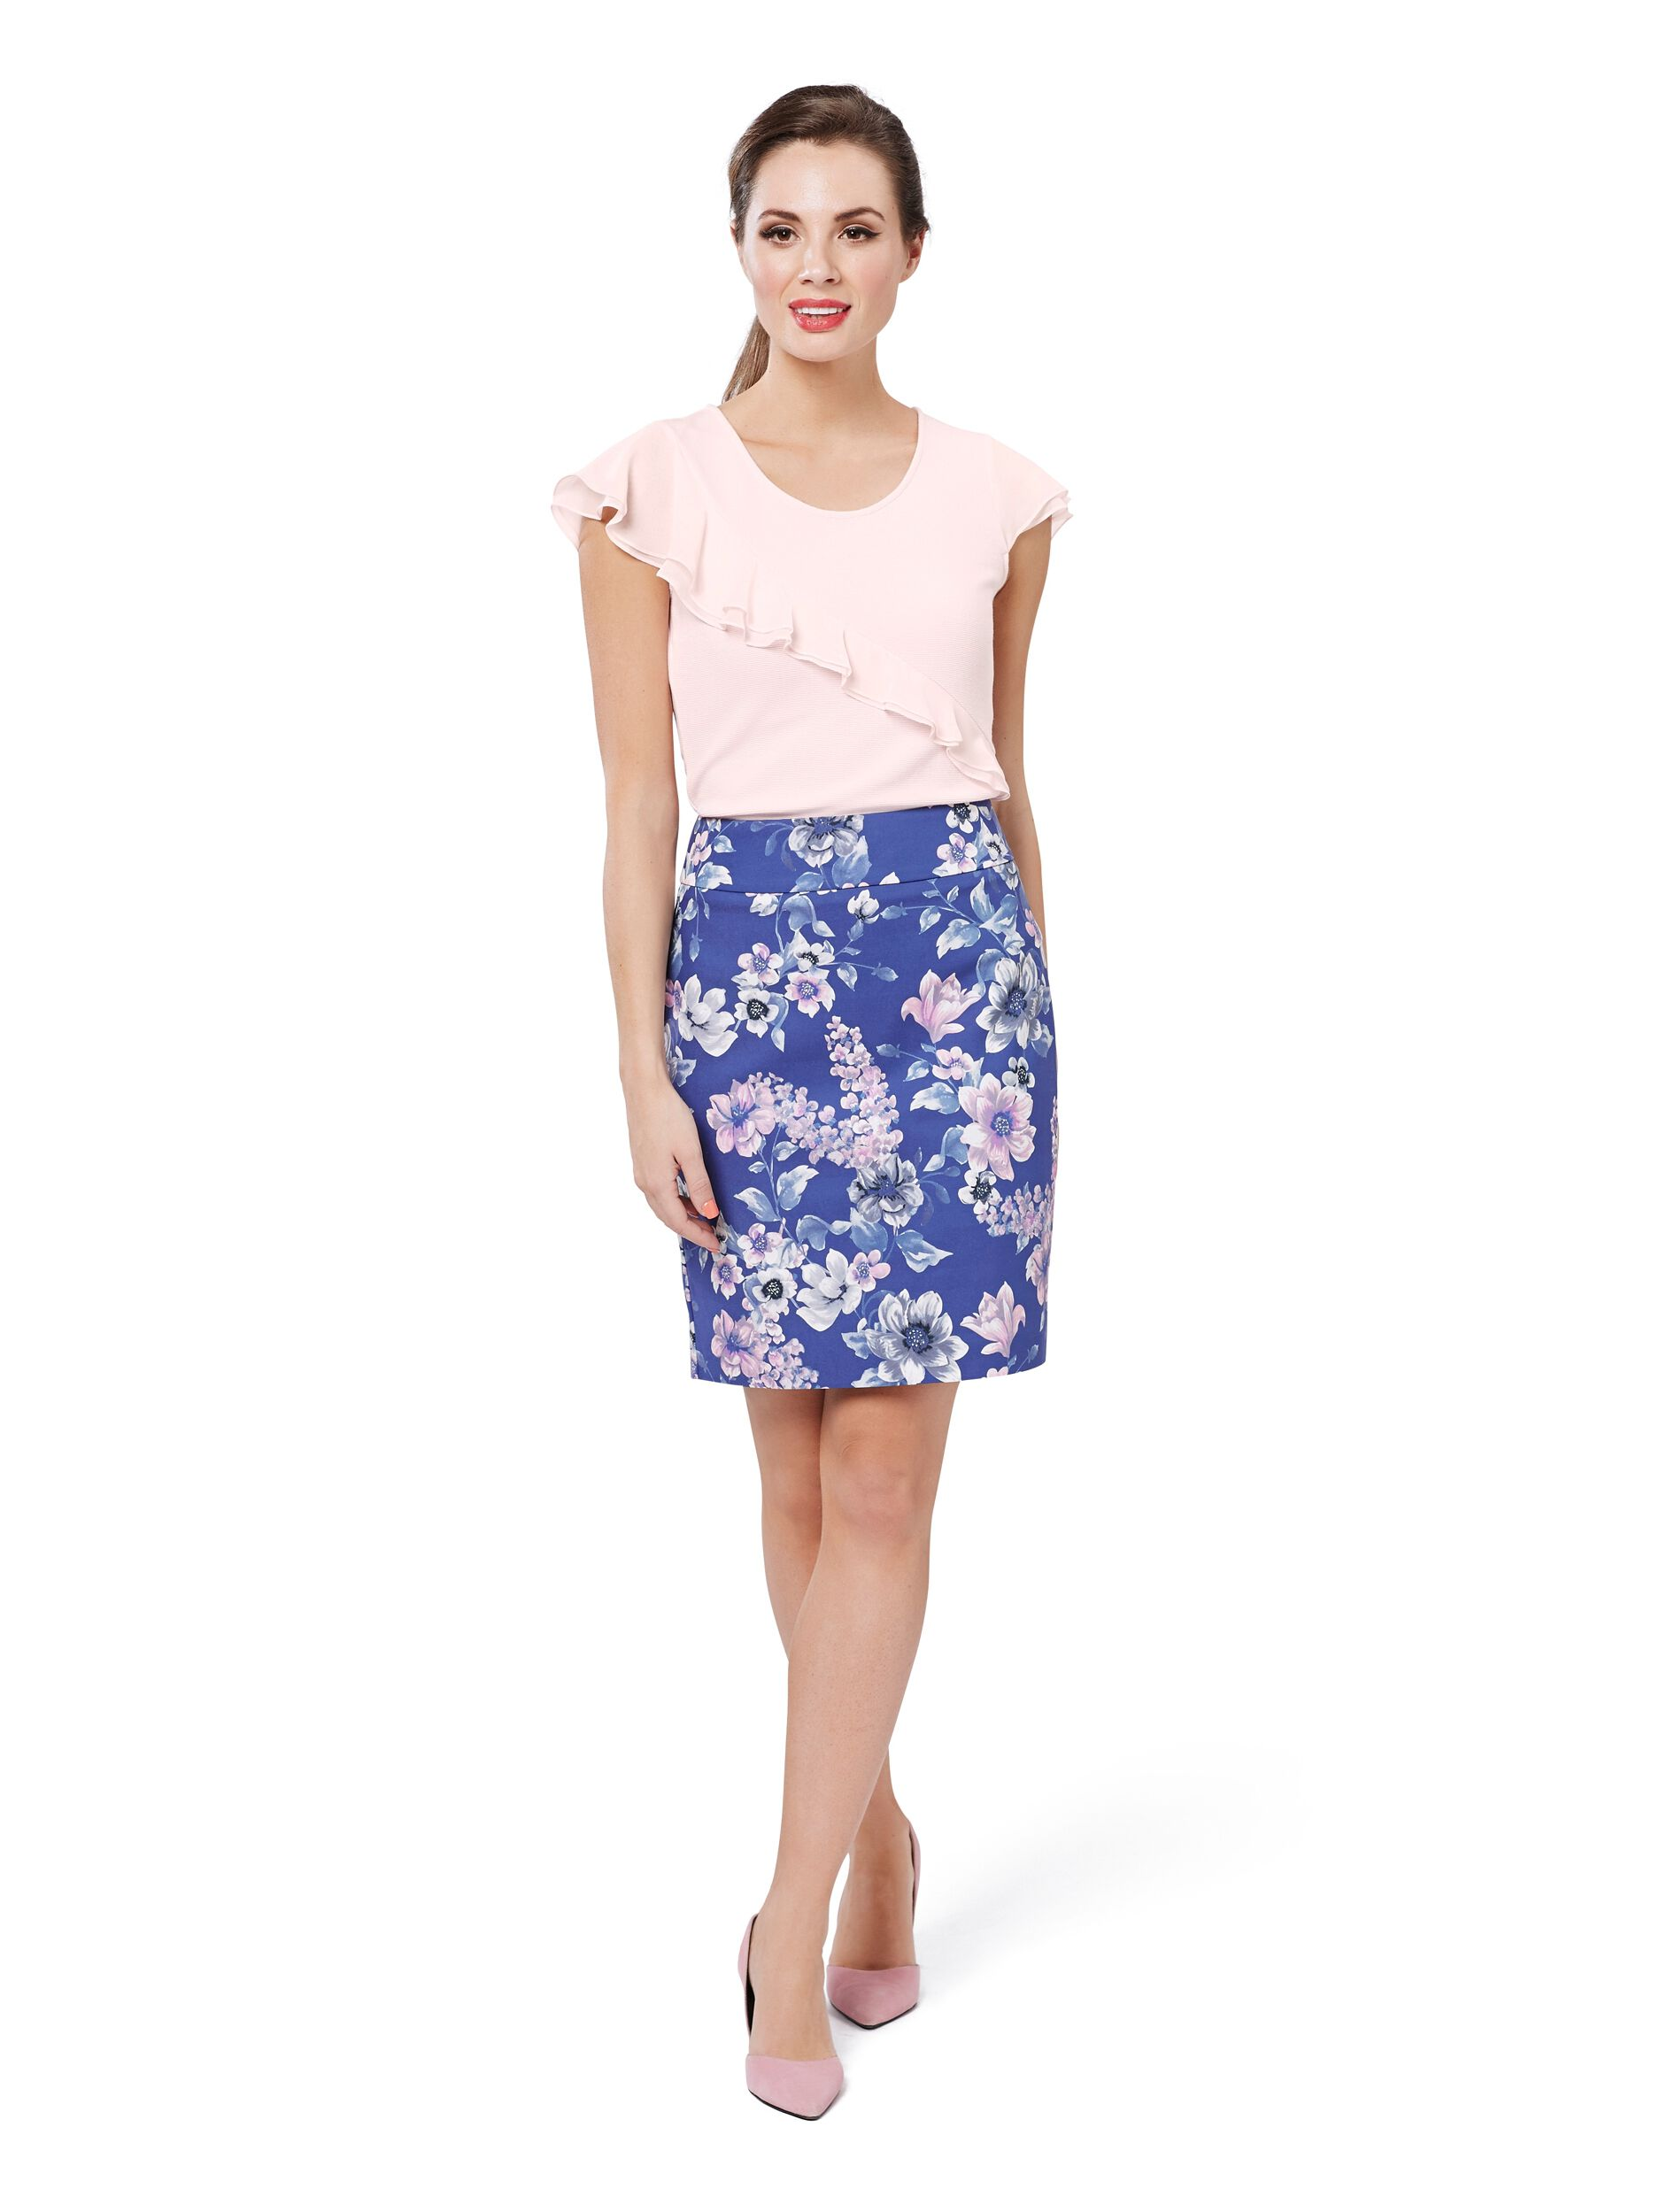 Elouise Skirt